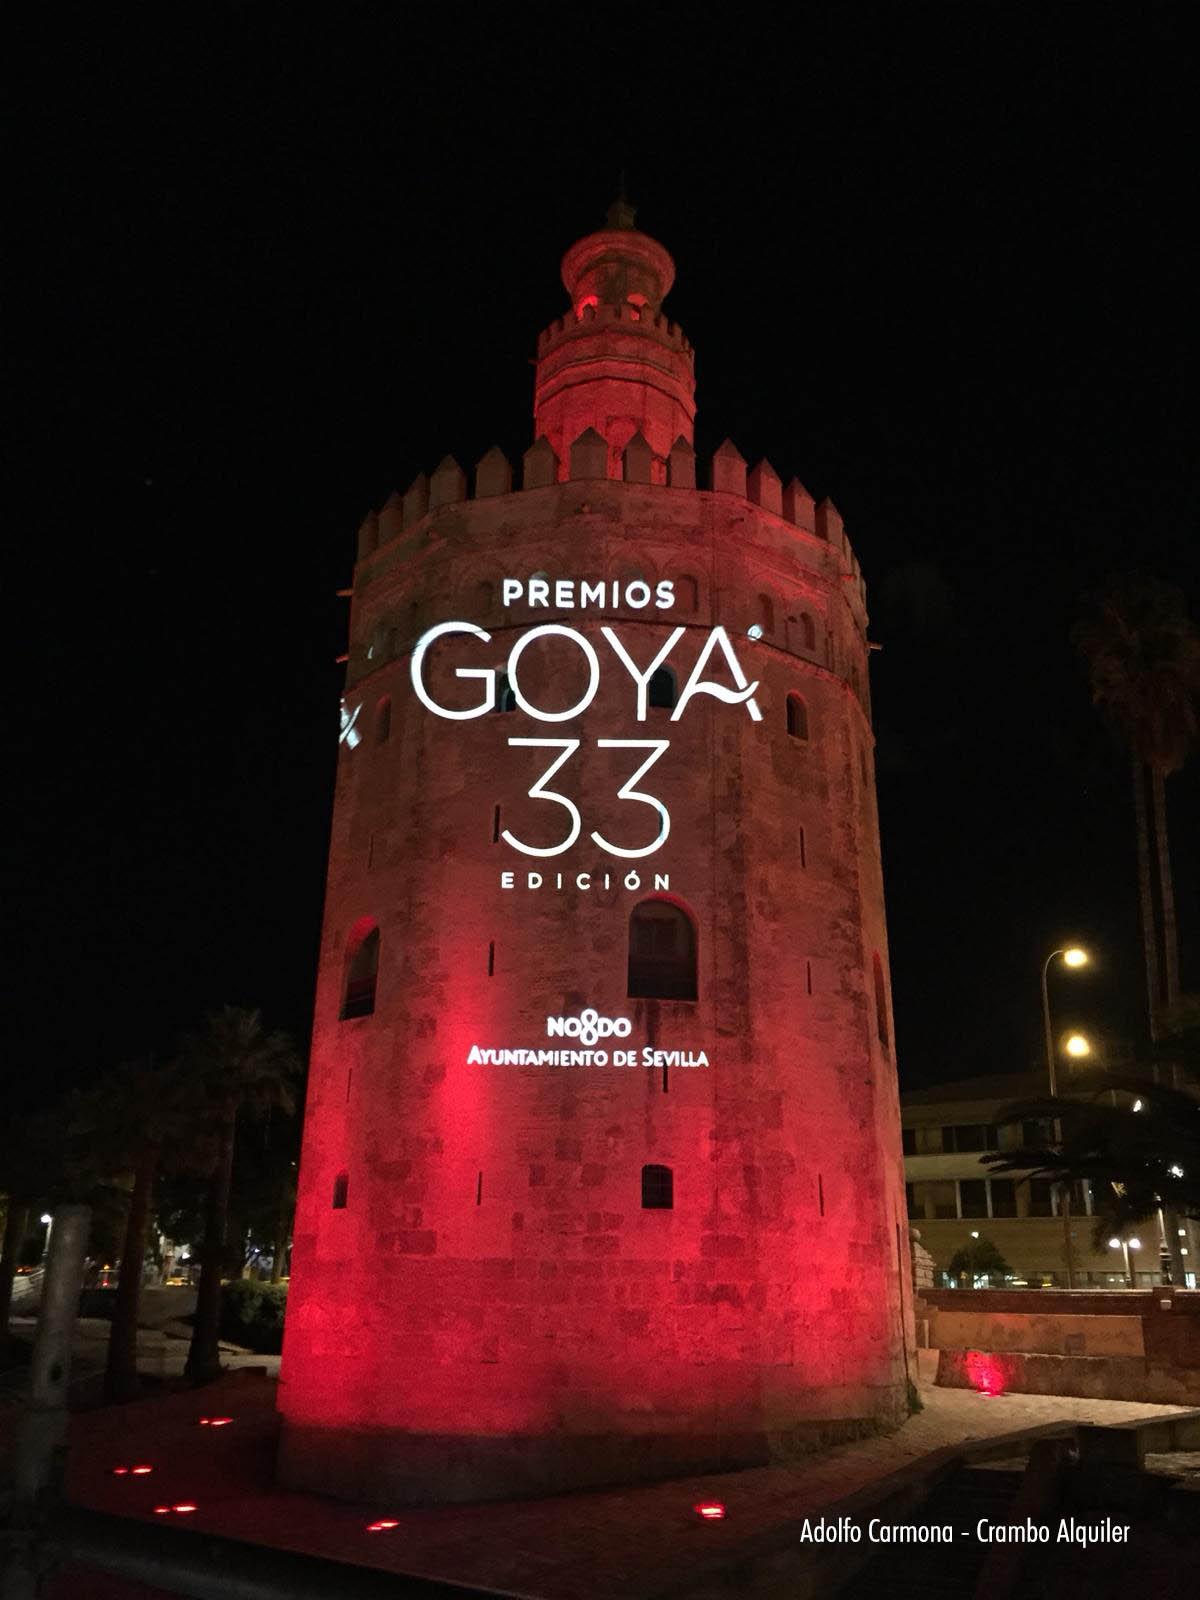 Stonex, Ayrton, iluminación, Los Goya